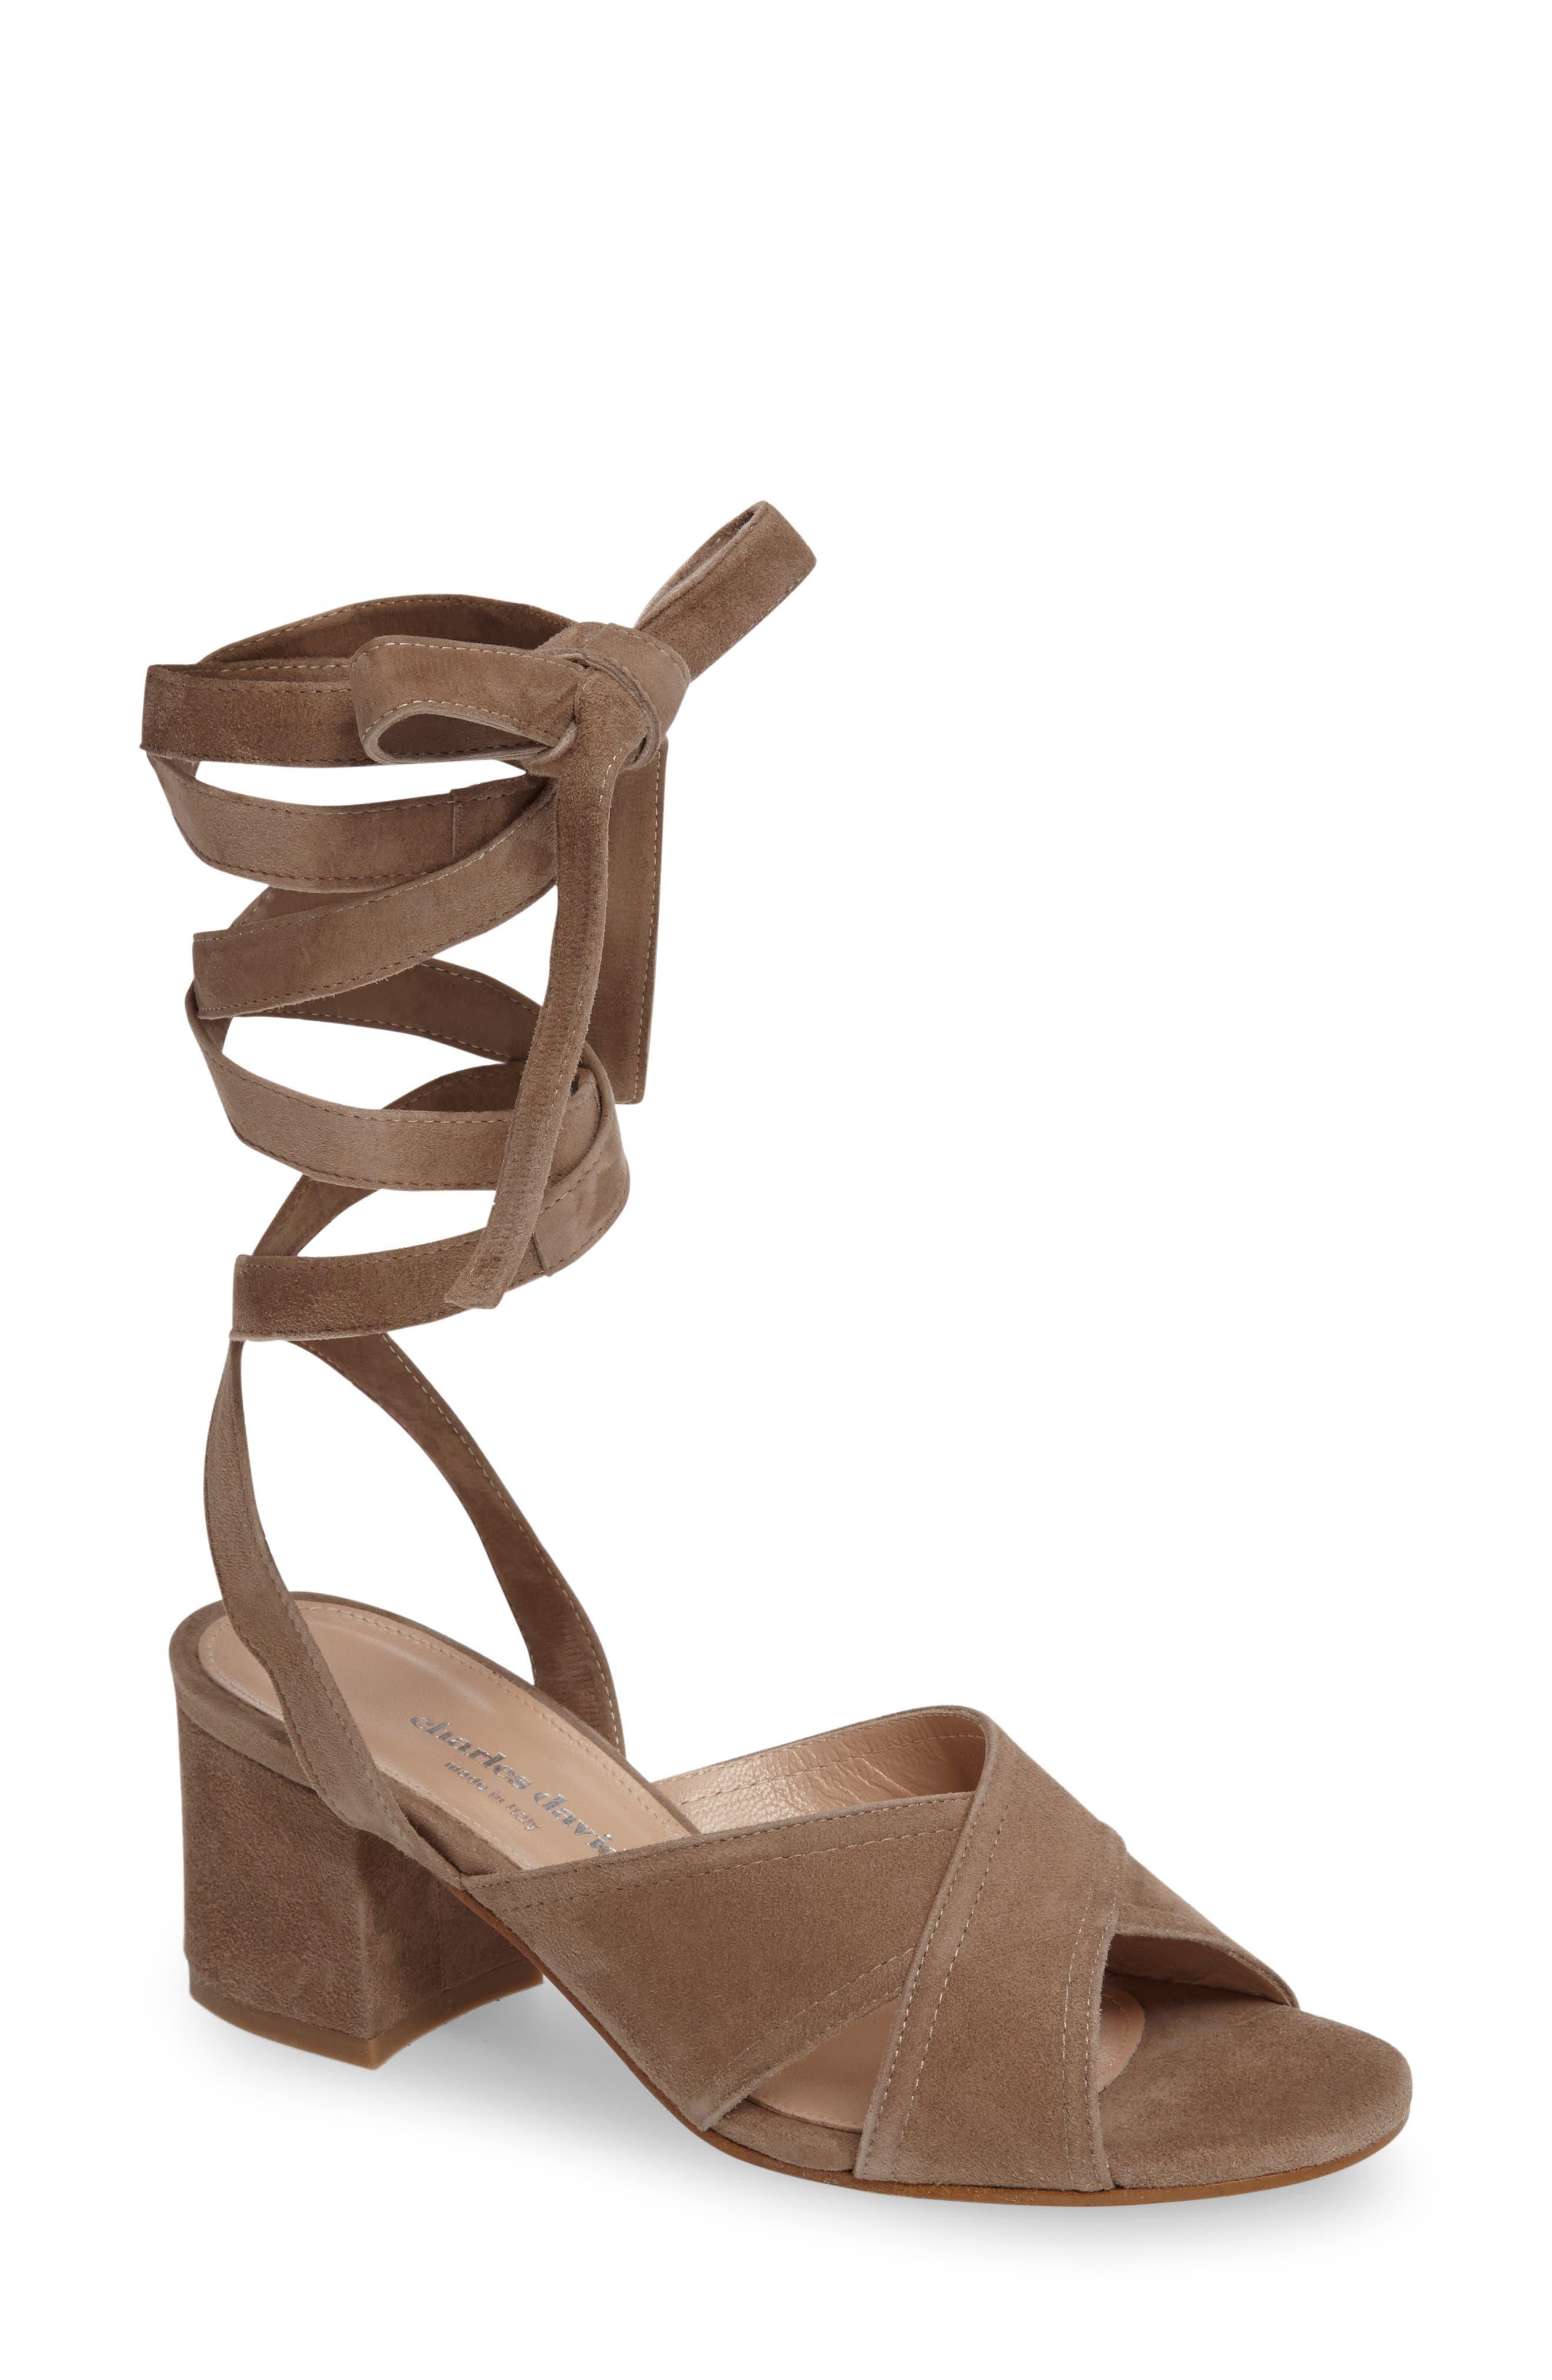 Main Image - Charles David Blossom Wraparound Sandal (Women)